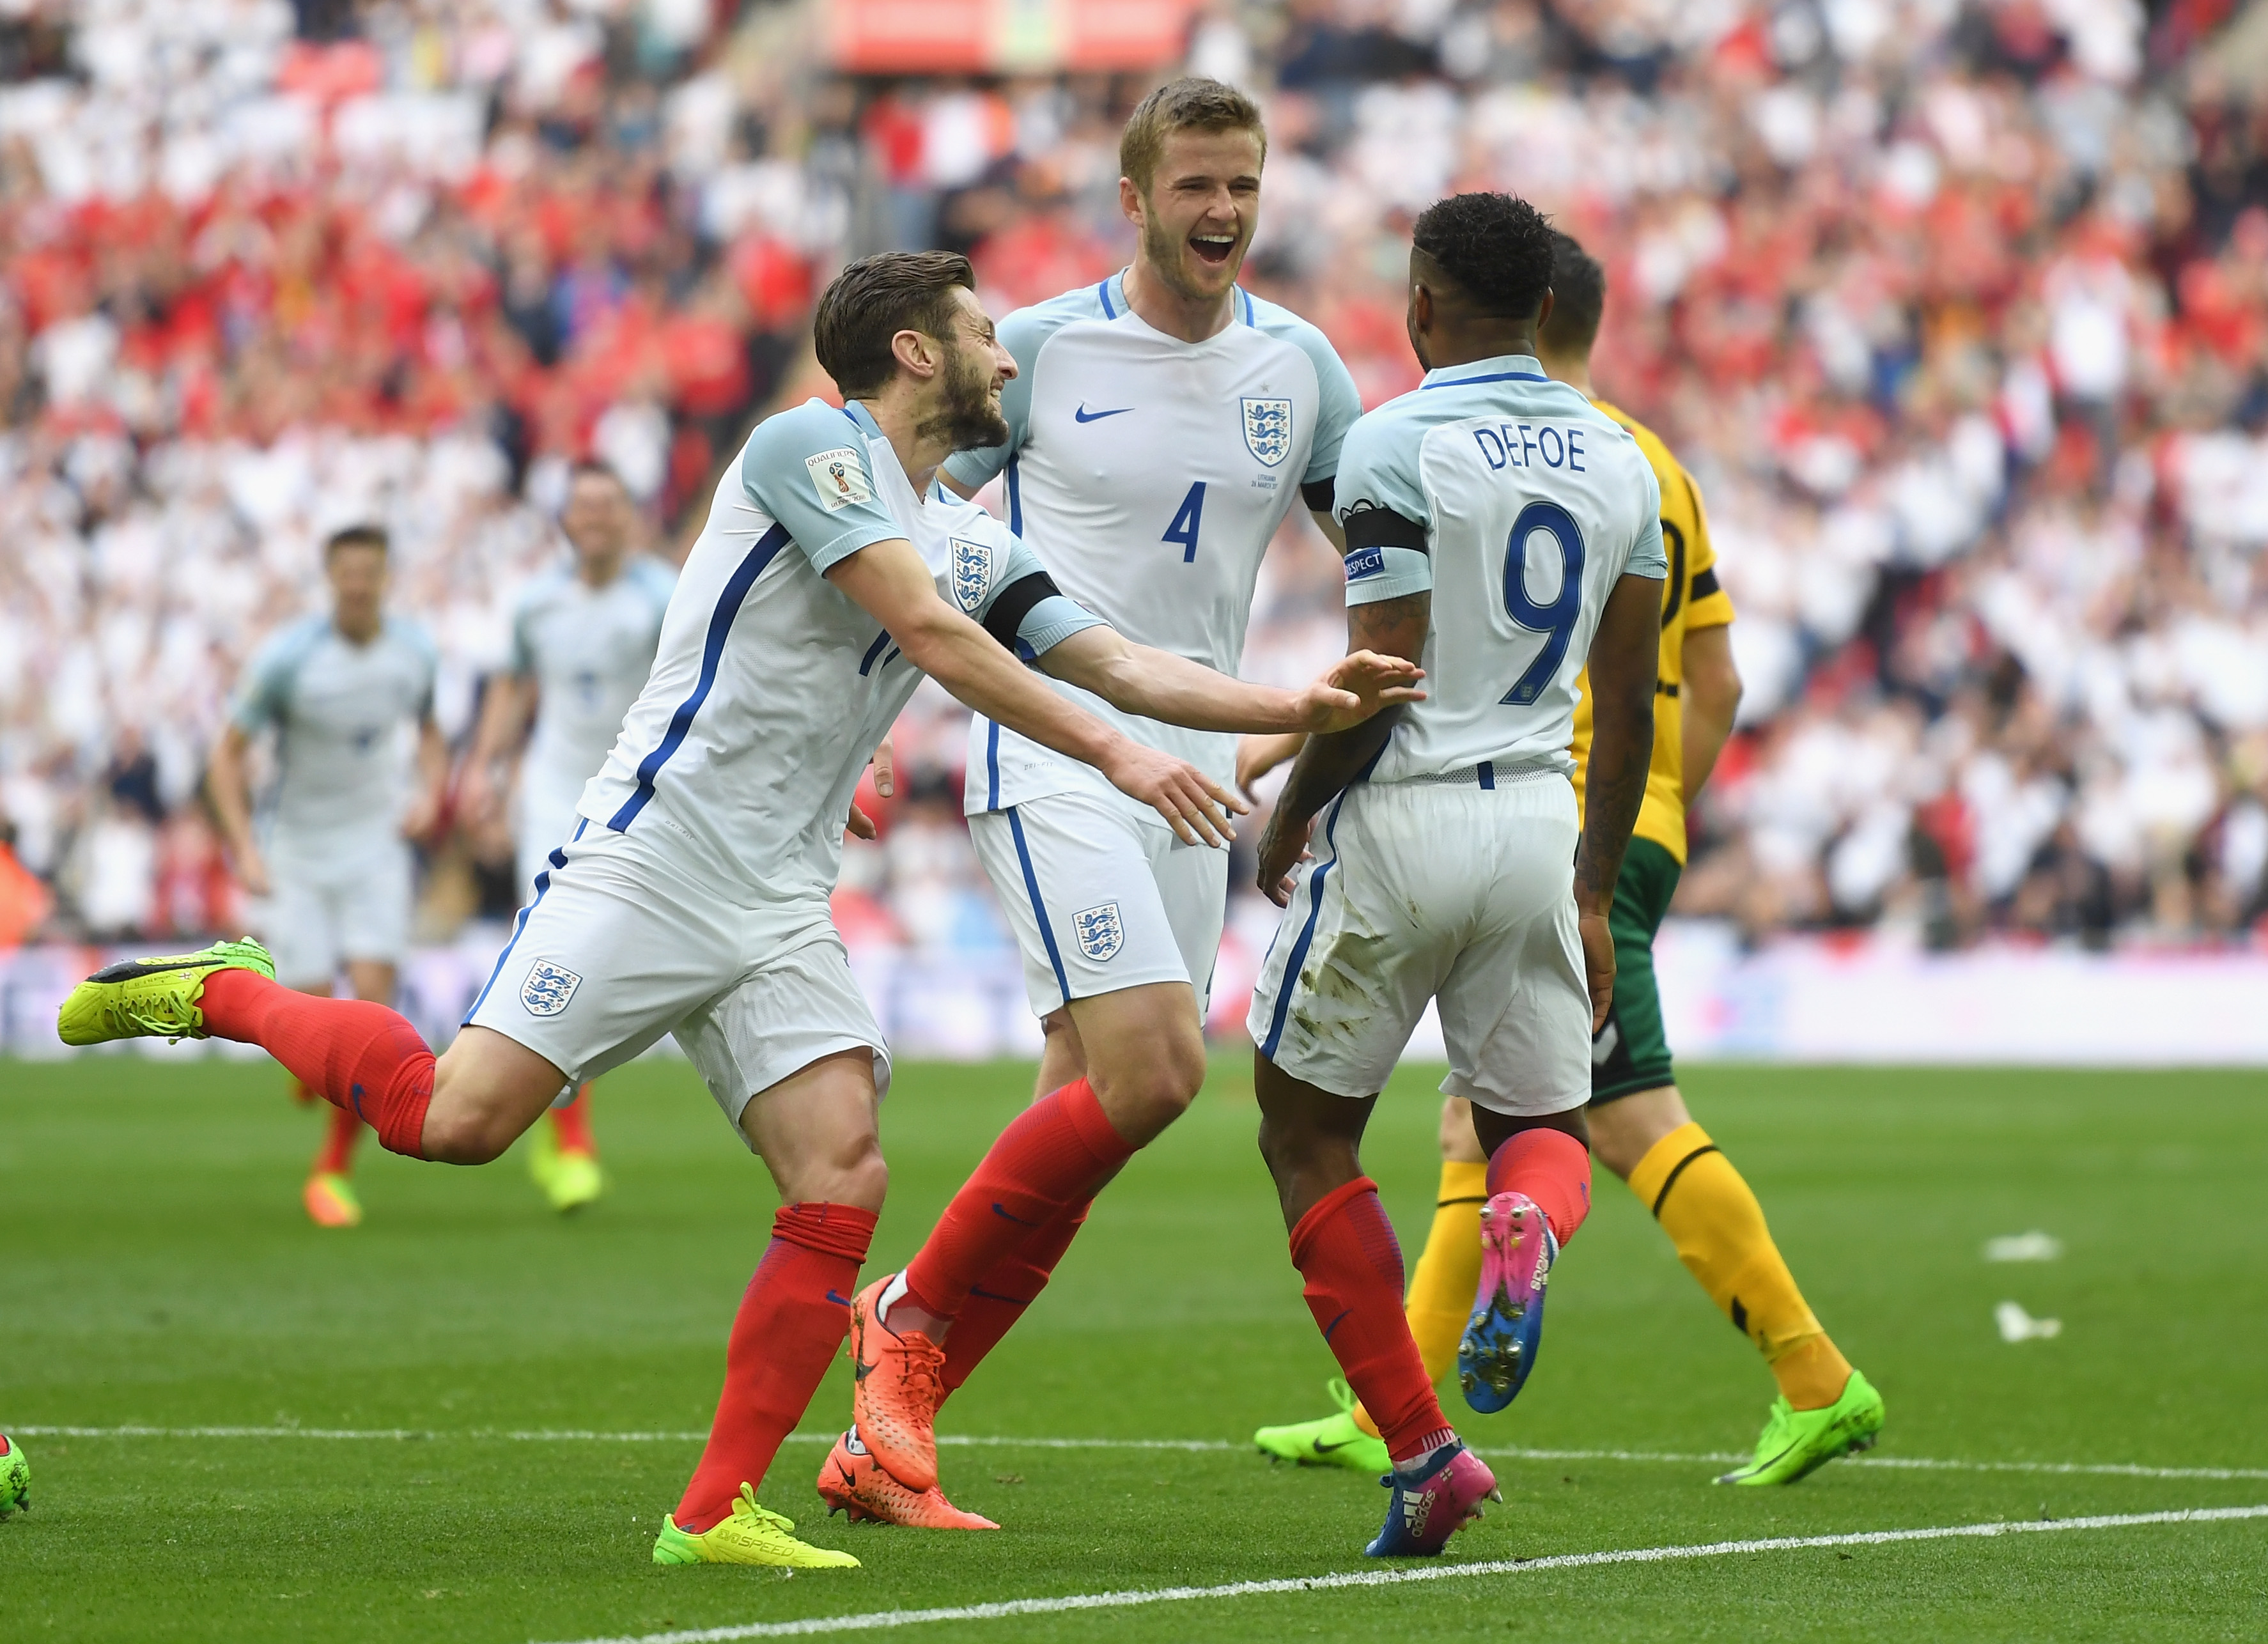 657992986-england-v-lithuania-fifa-2018-world-cup-qualifier.jpg